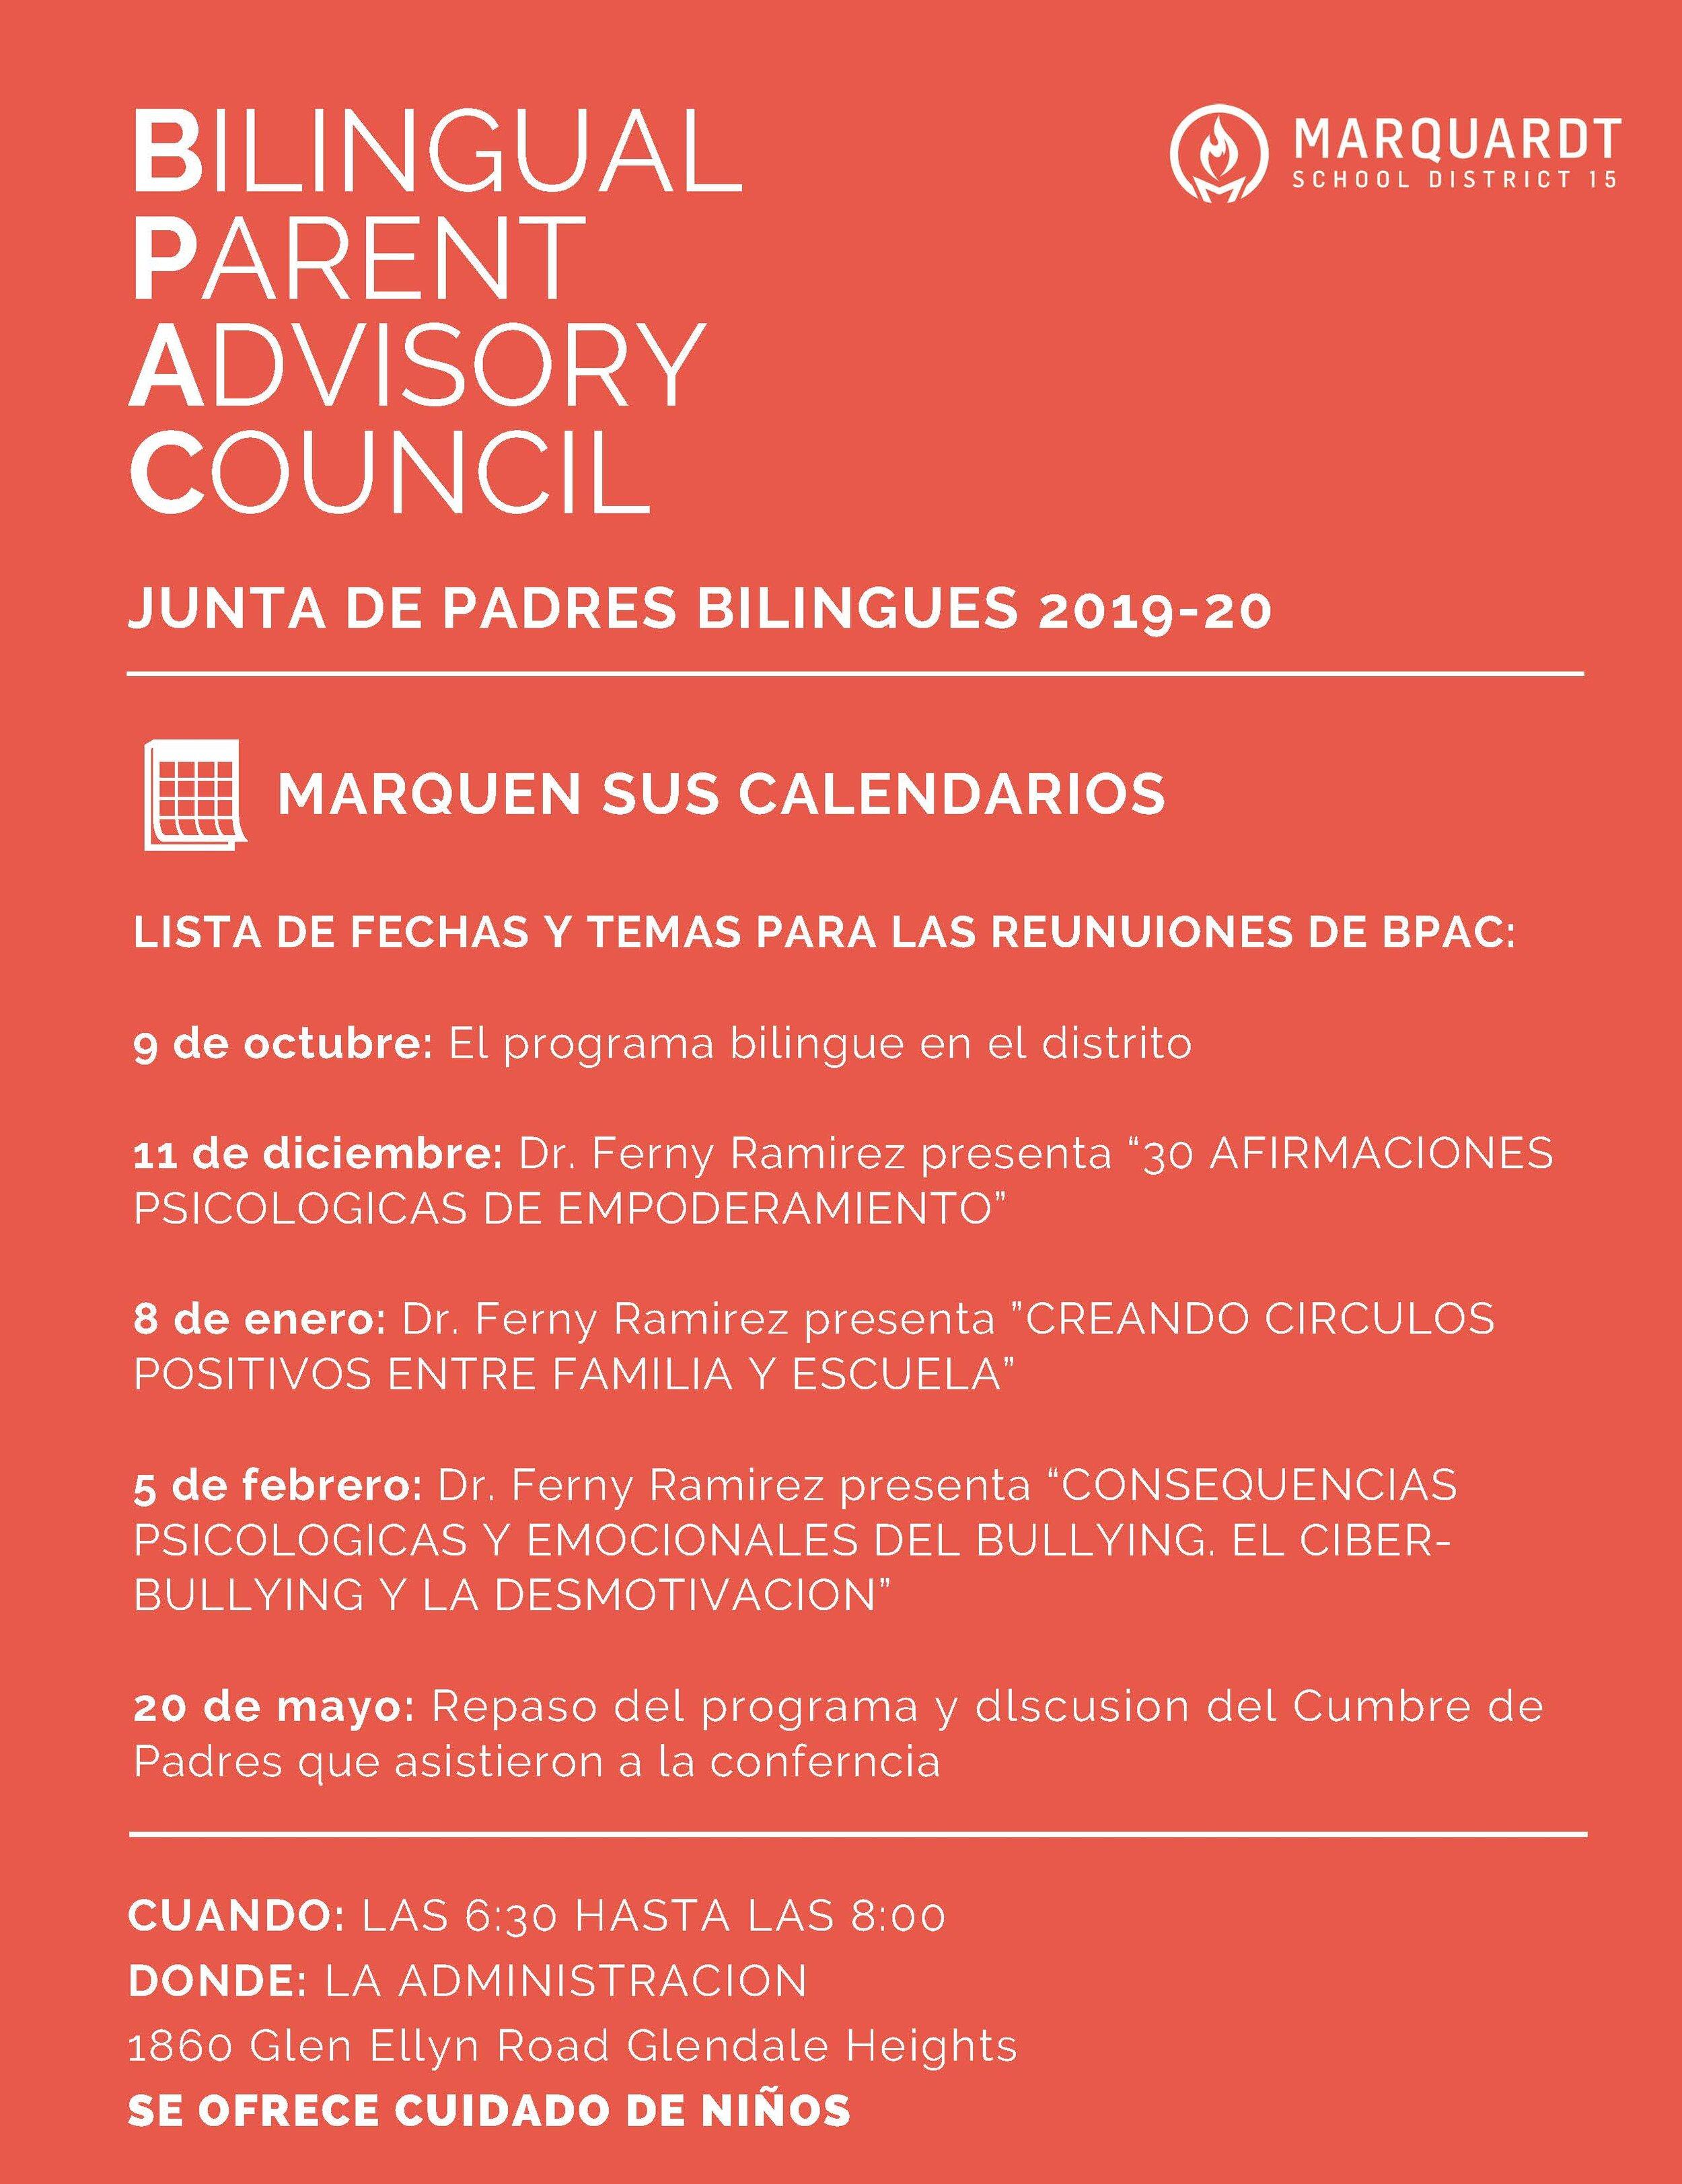 bilingual parent advisory council_1920 (3).jpg